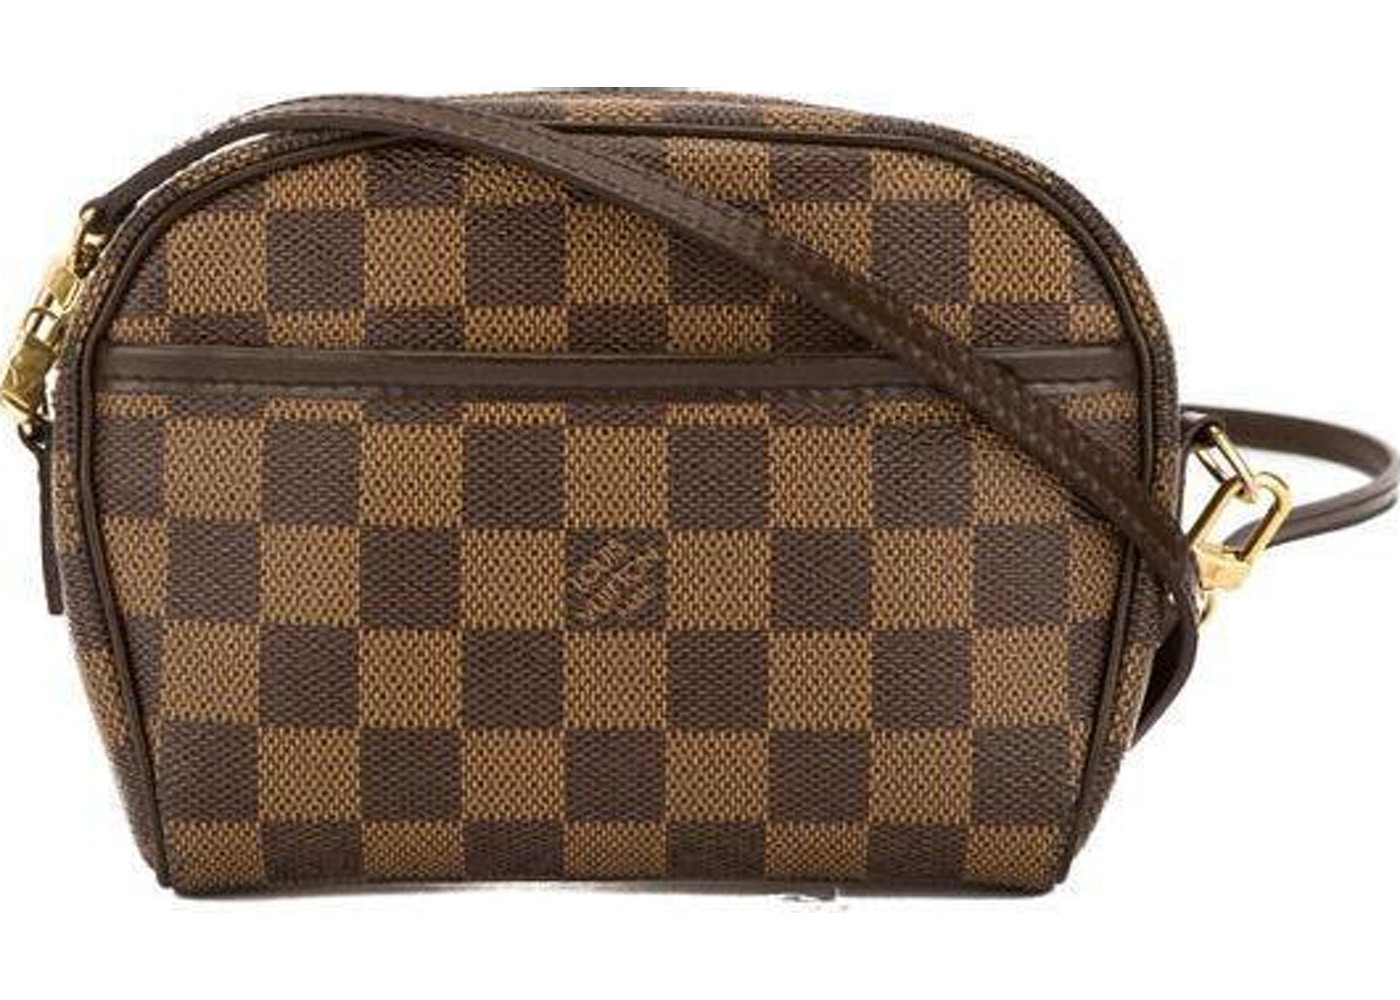 bea6bca7f Louis Vuitton Pochette Ipanema Damier Ebene